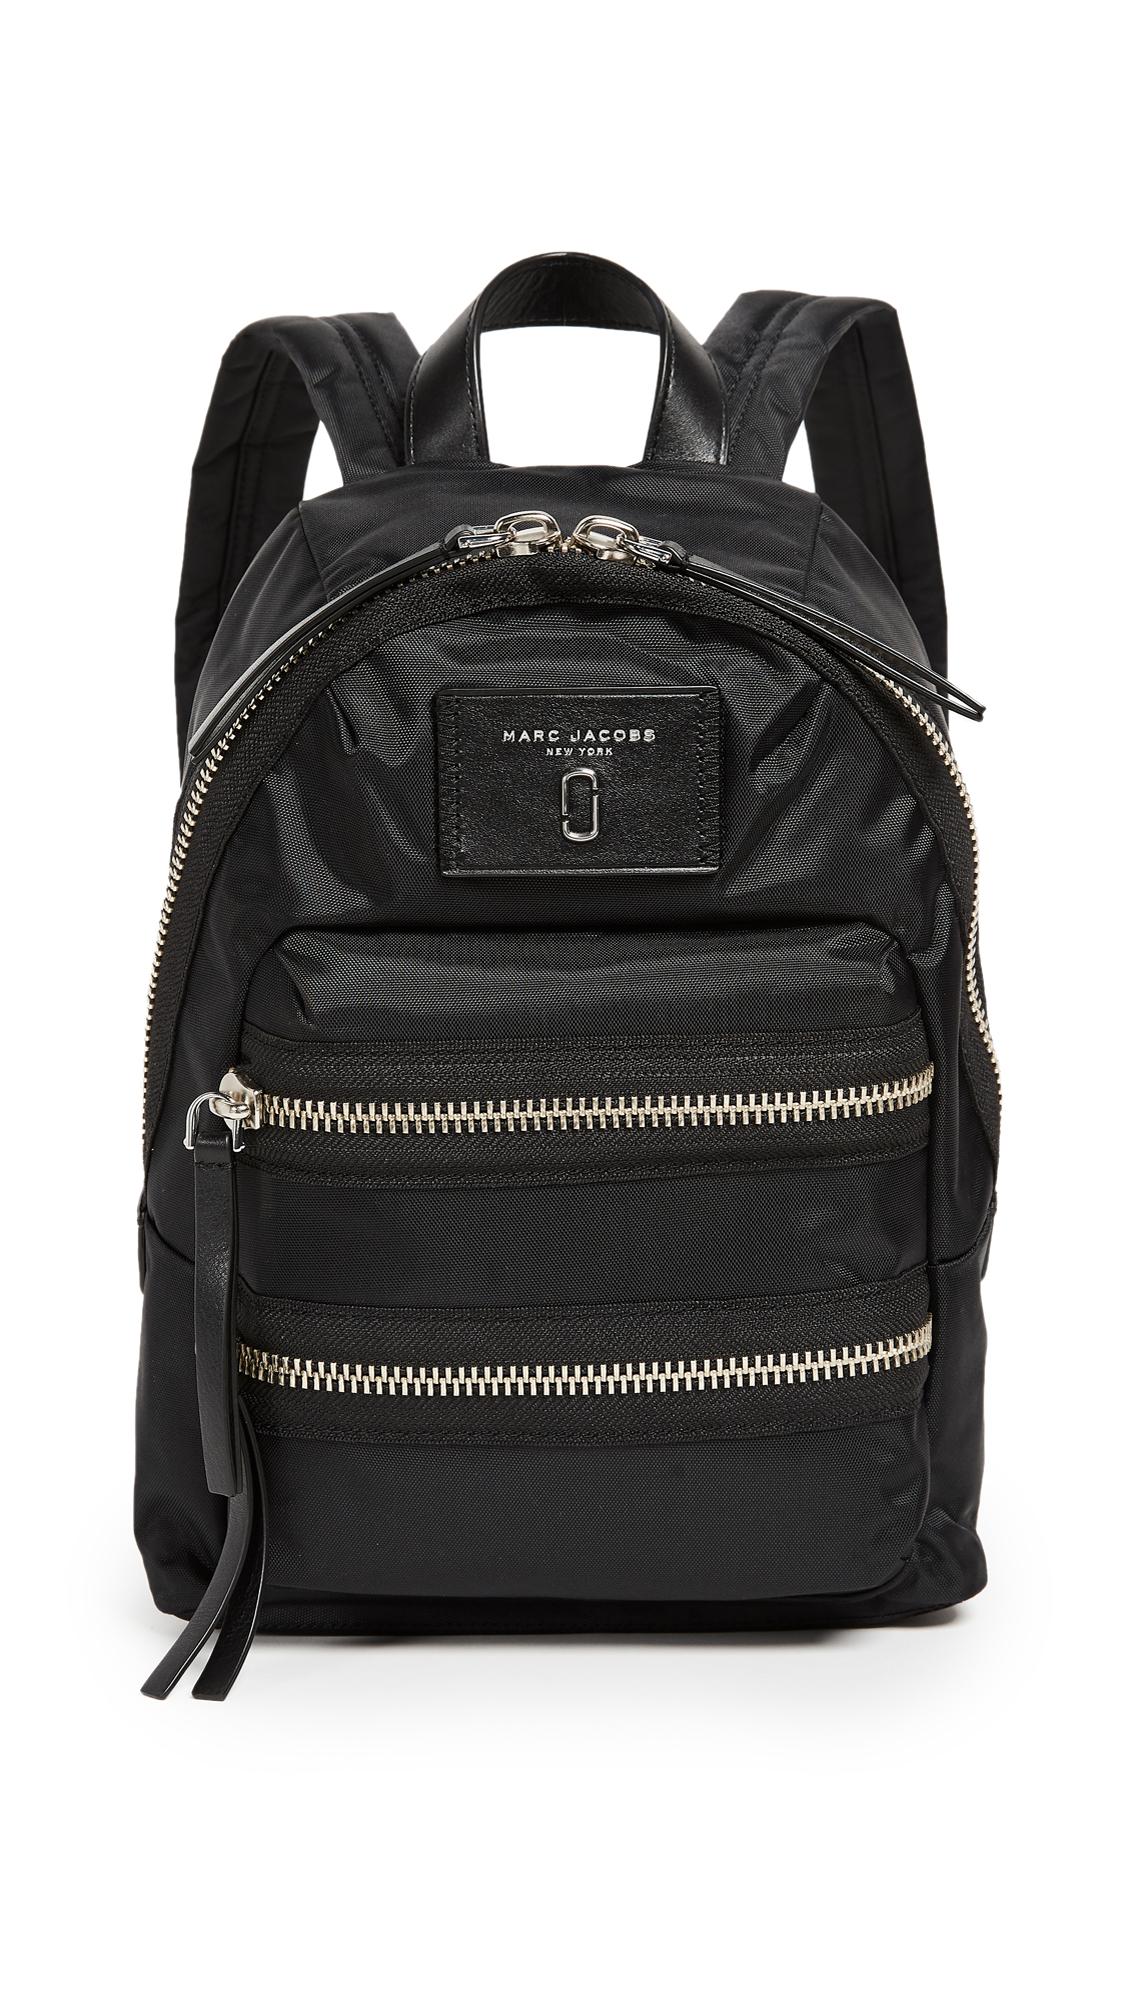 Marc Jacobs Mini Nylon Biker Backpack - Black